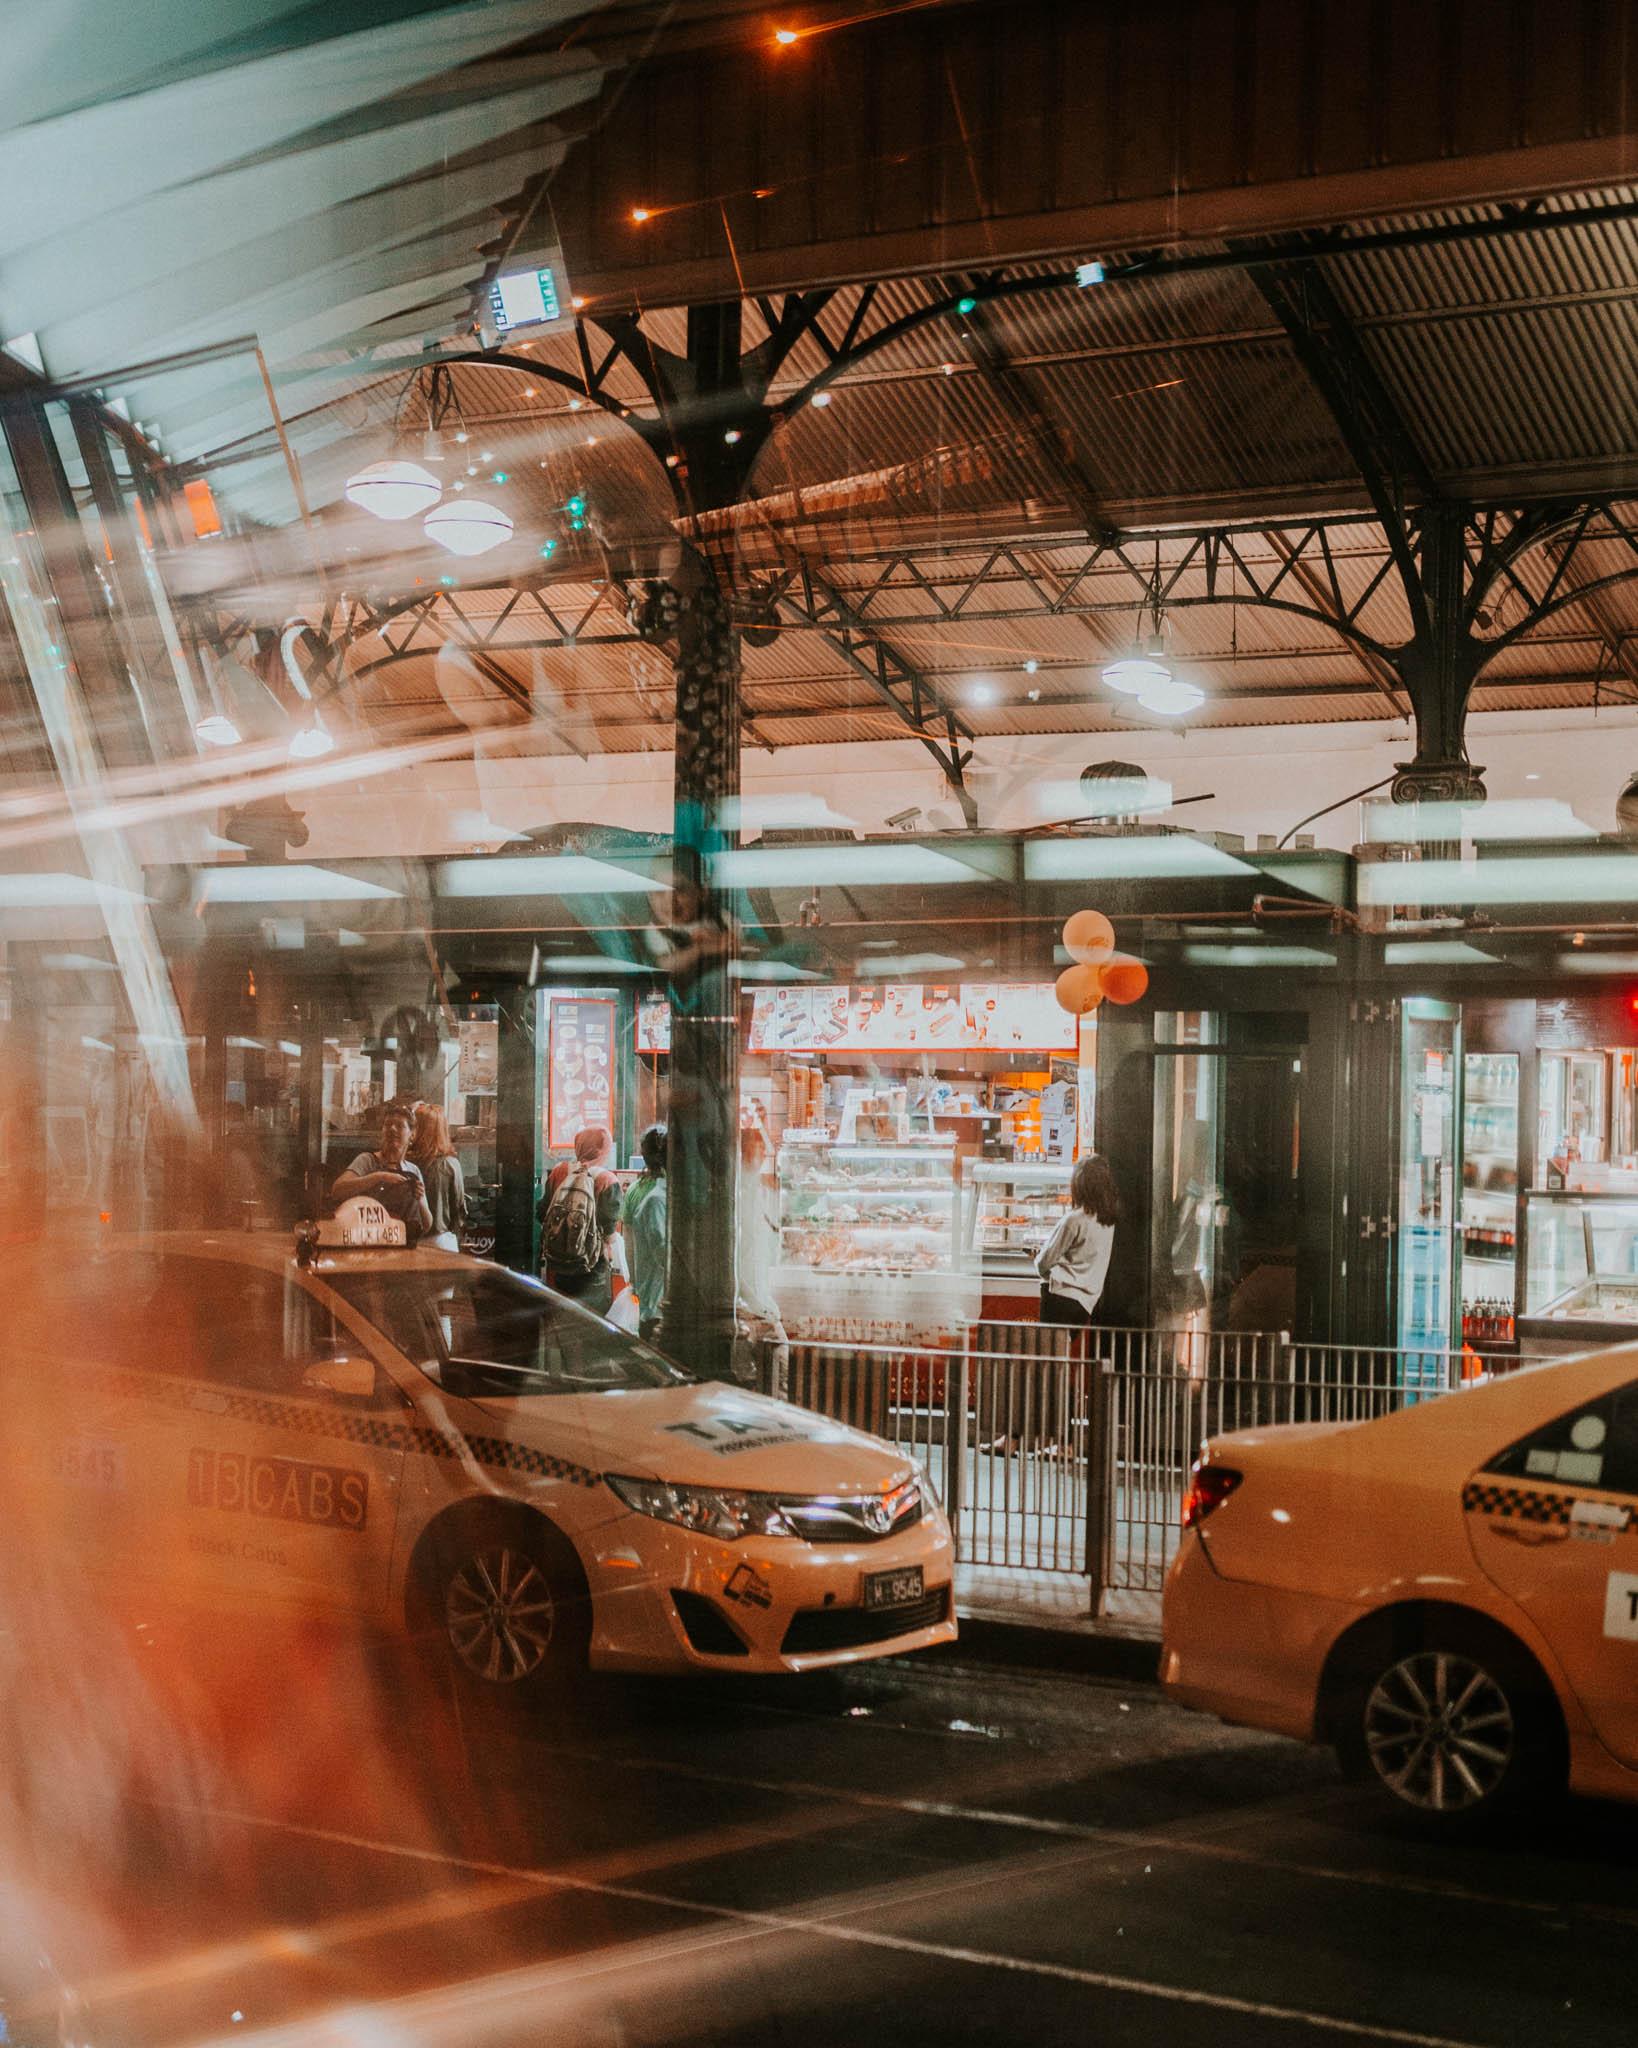 melbourne-taxis-benjamin-andrew.jpg